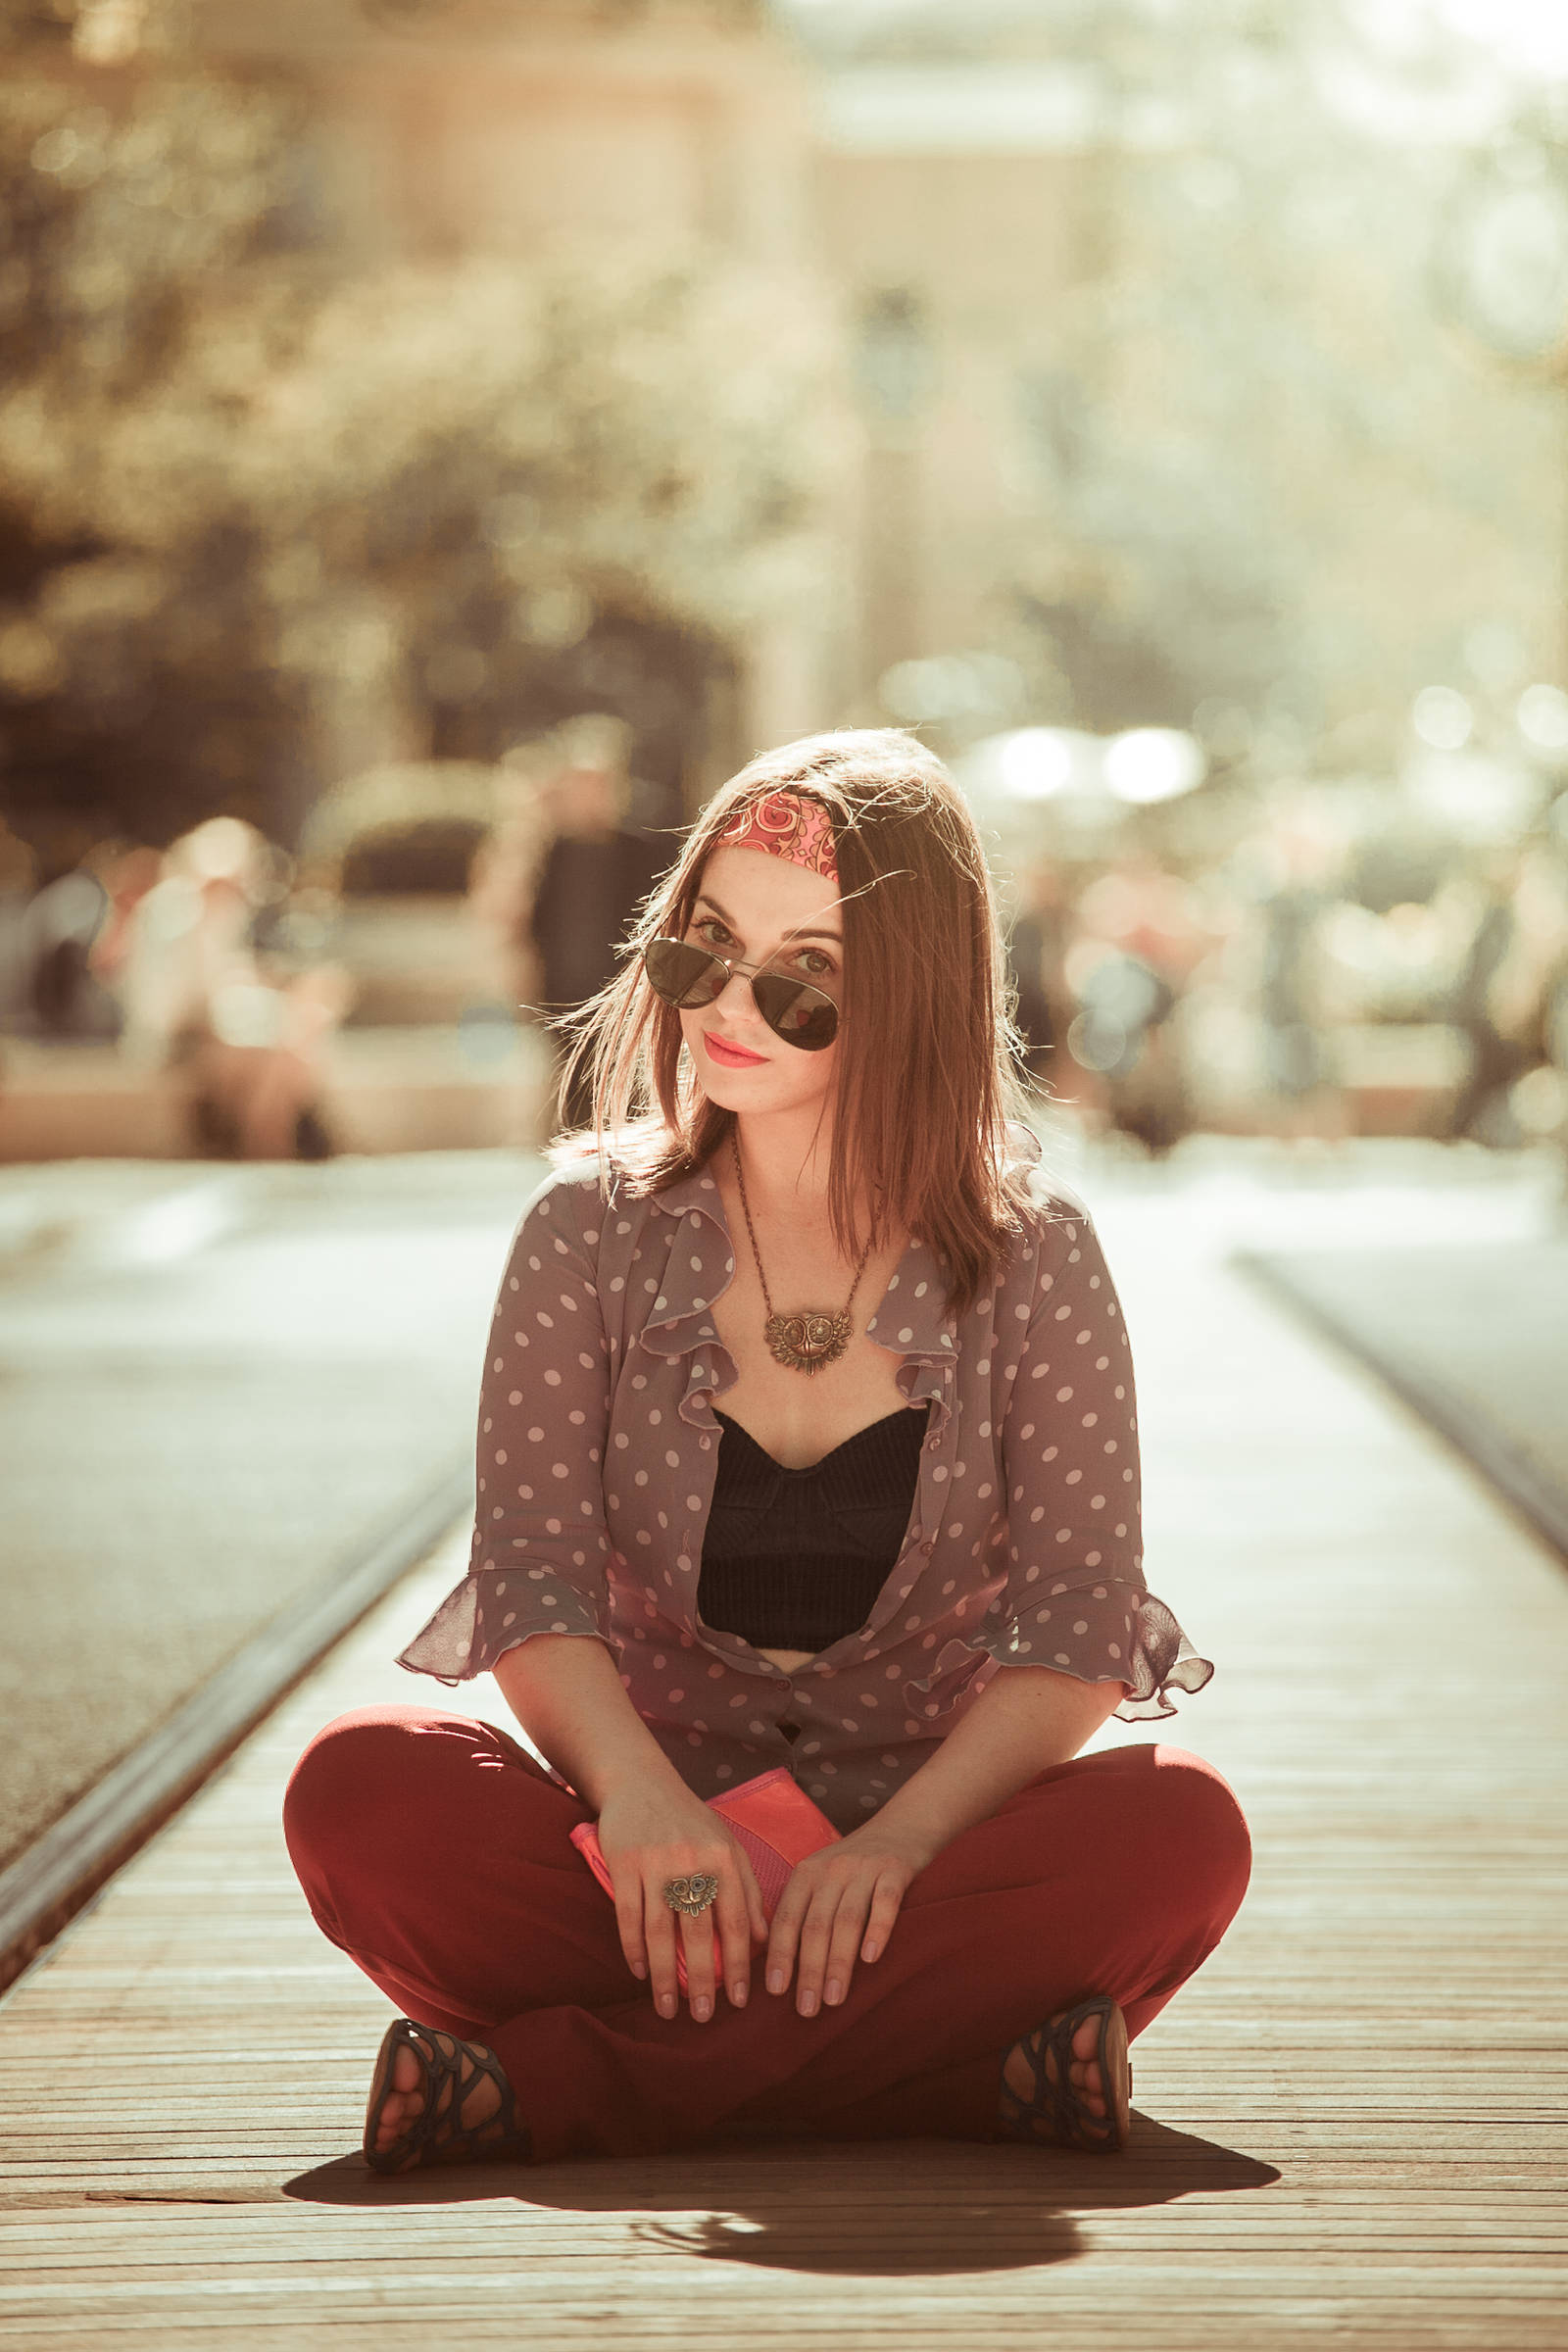 Glendale hippie by xn3ctz